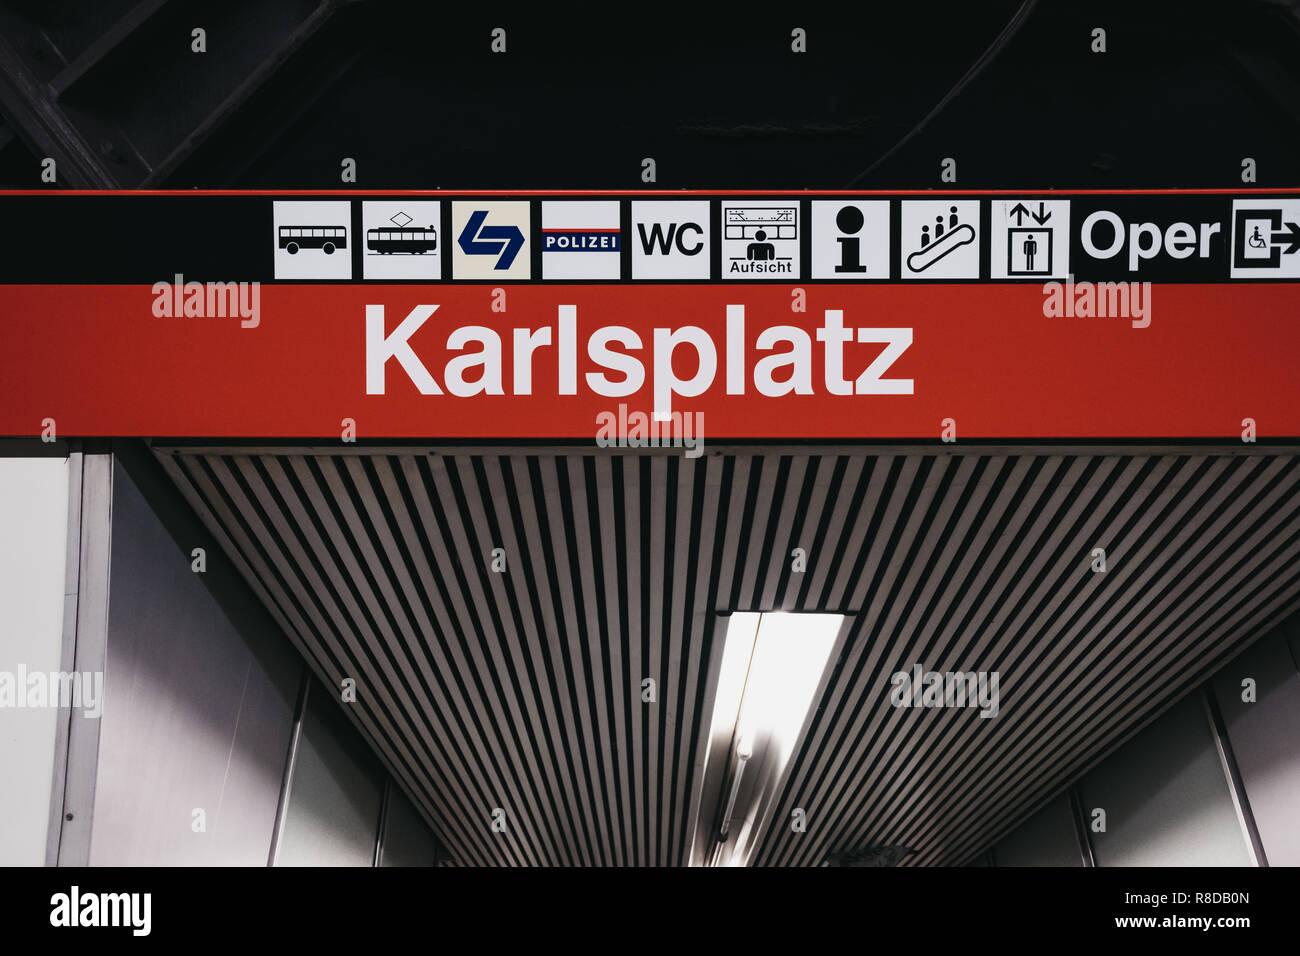 Vienna, Austria - November 25, 2018: Station name sign and directions inside Karlsplatz station in Vienna. Vienna public transport, Wiener Linien, ope - Stock Image